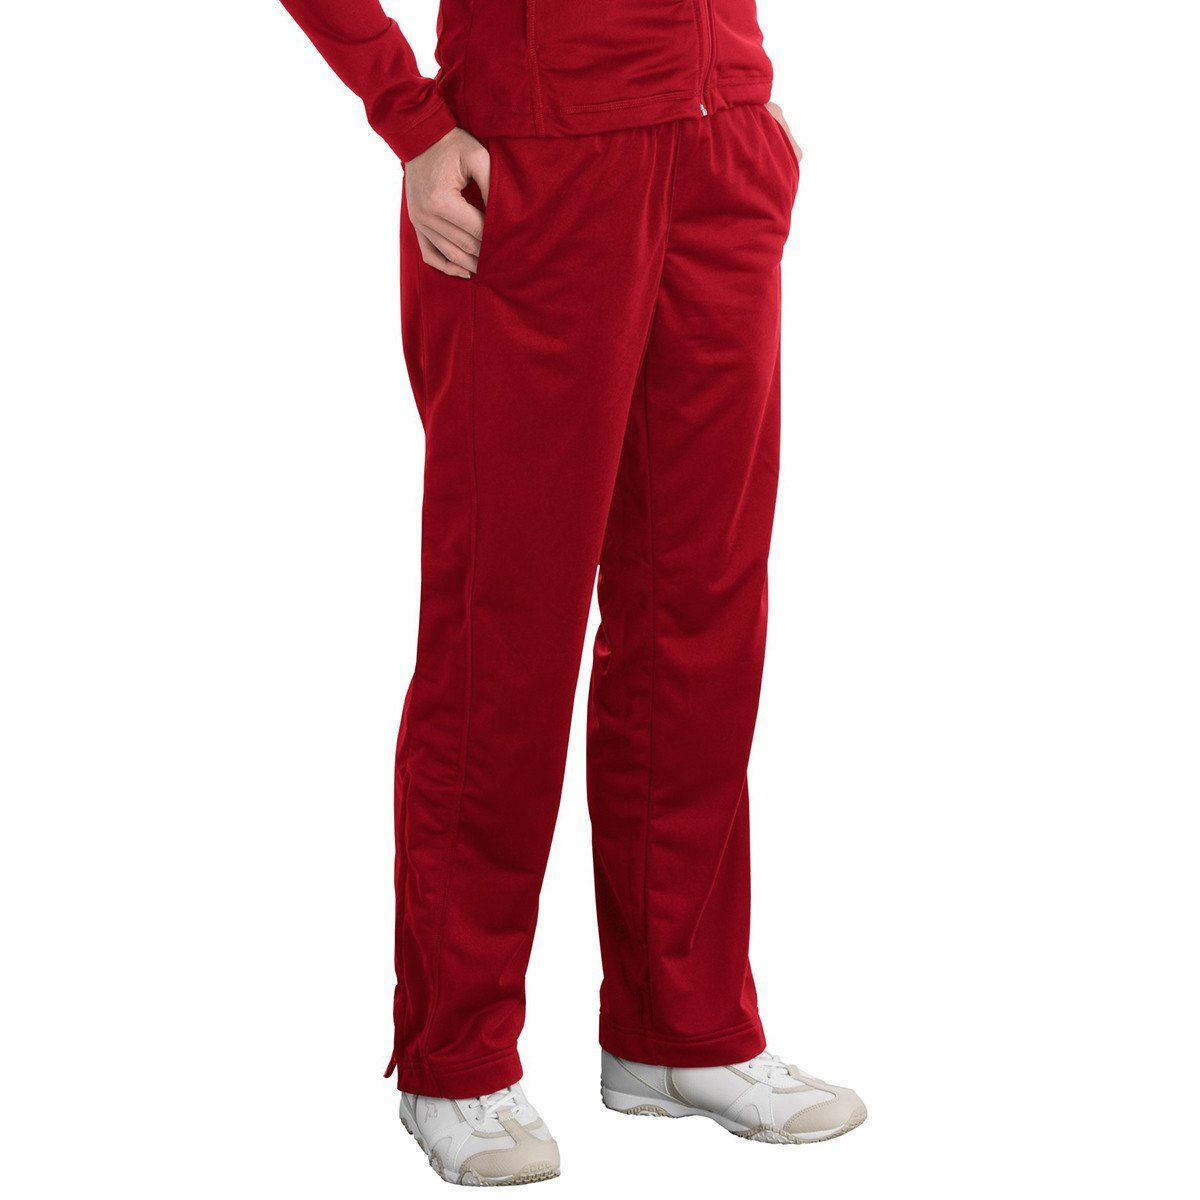 SportTek Women's True Red Tricot Track Pant Tricot